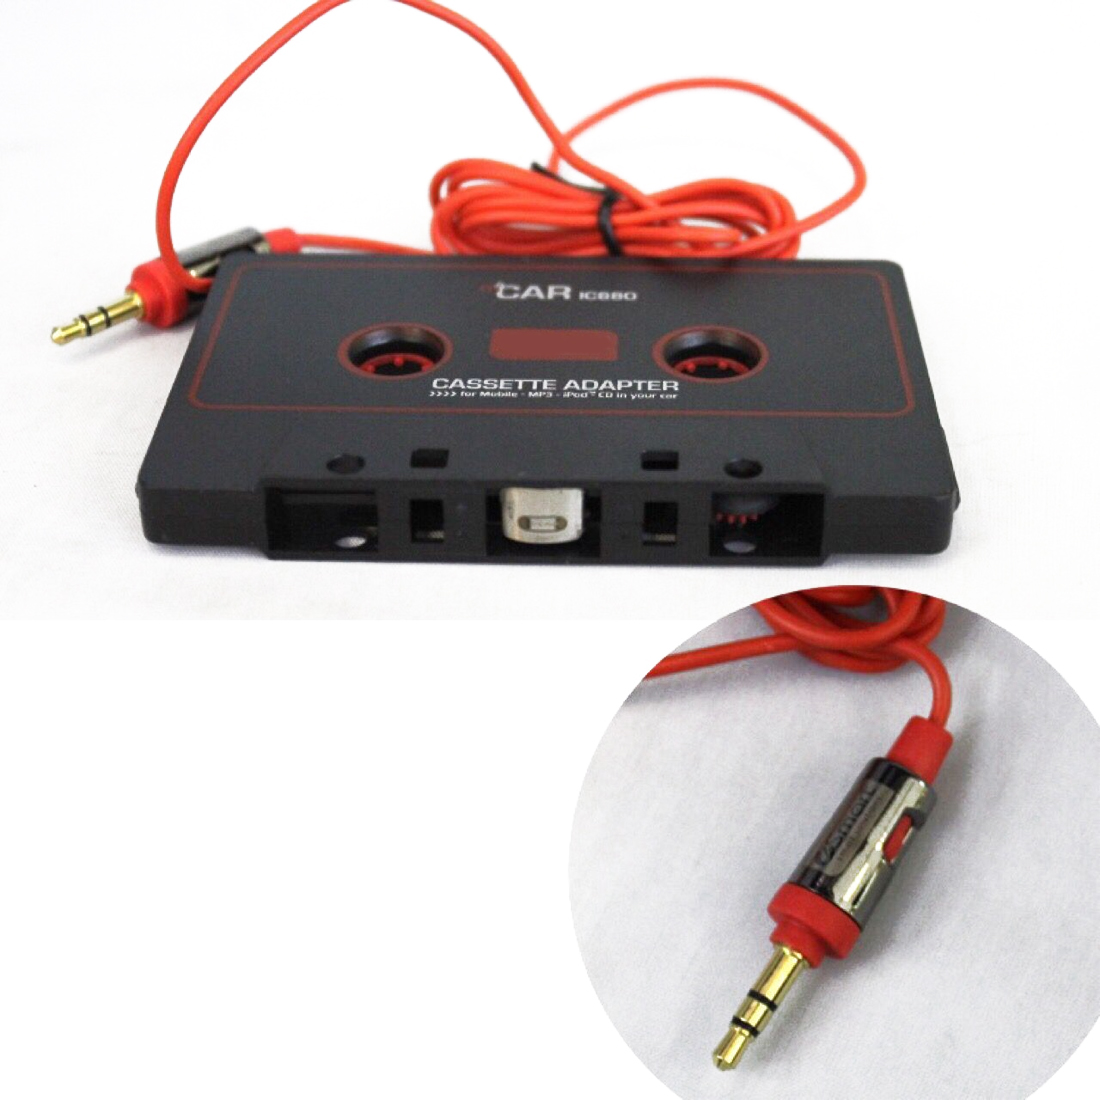 Marsnaska Mobil Kaset Tape Adaptor Mp3 Pemutar Konverter Untuk Casete Adapter Ipod Iphone Aux Kabel Cd 35 Mm Mendongkrak Steker Di Player